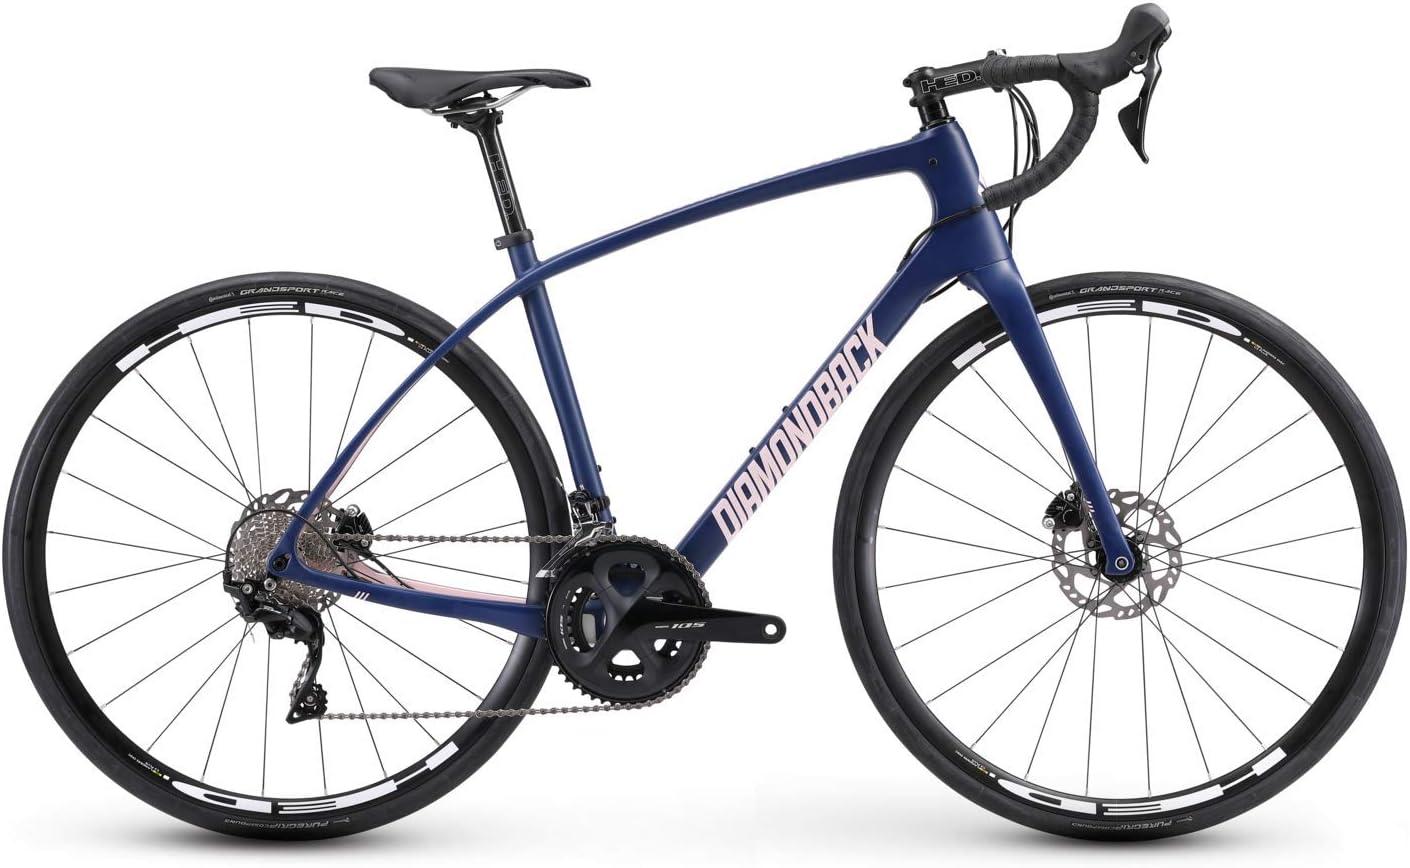 Diamondback Women's Endurance Road Bike - Best cyclocross bike